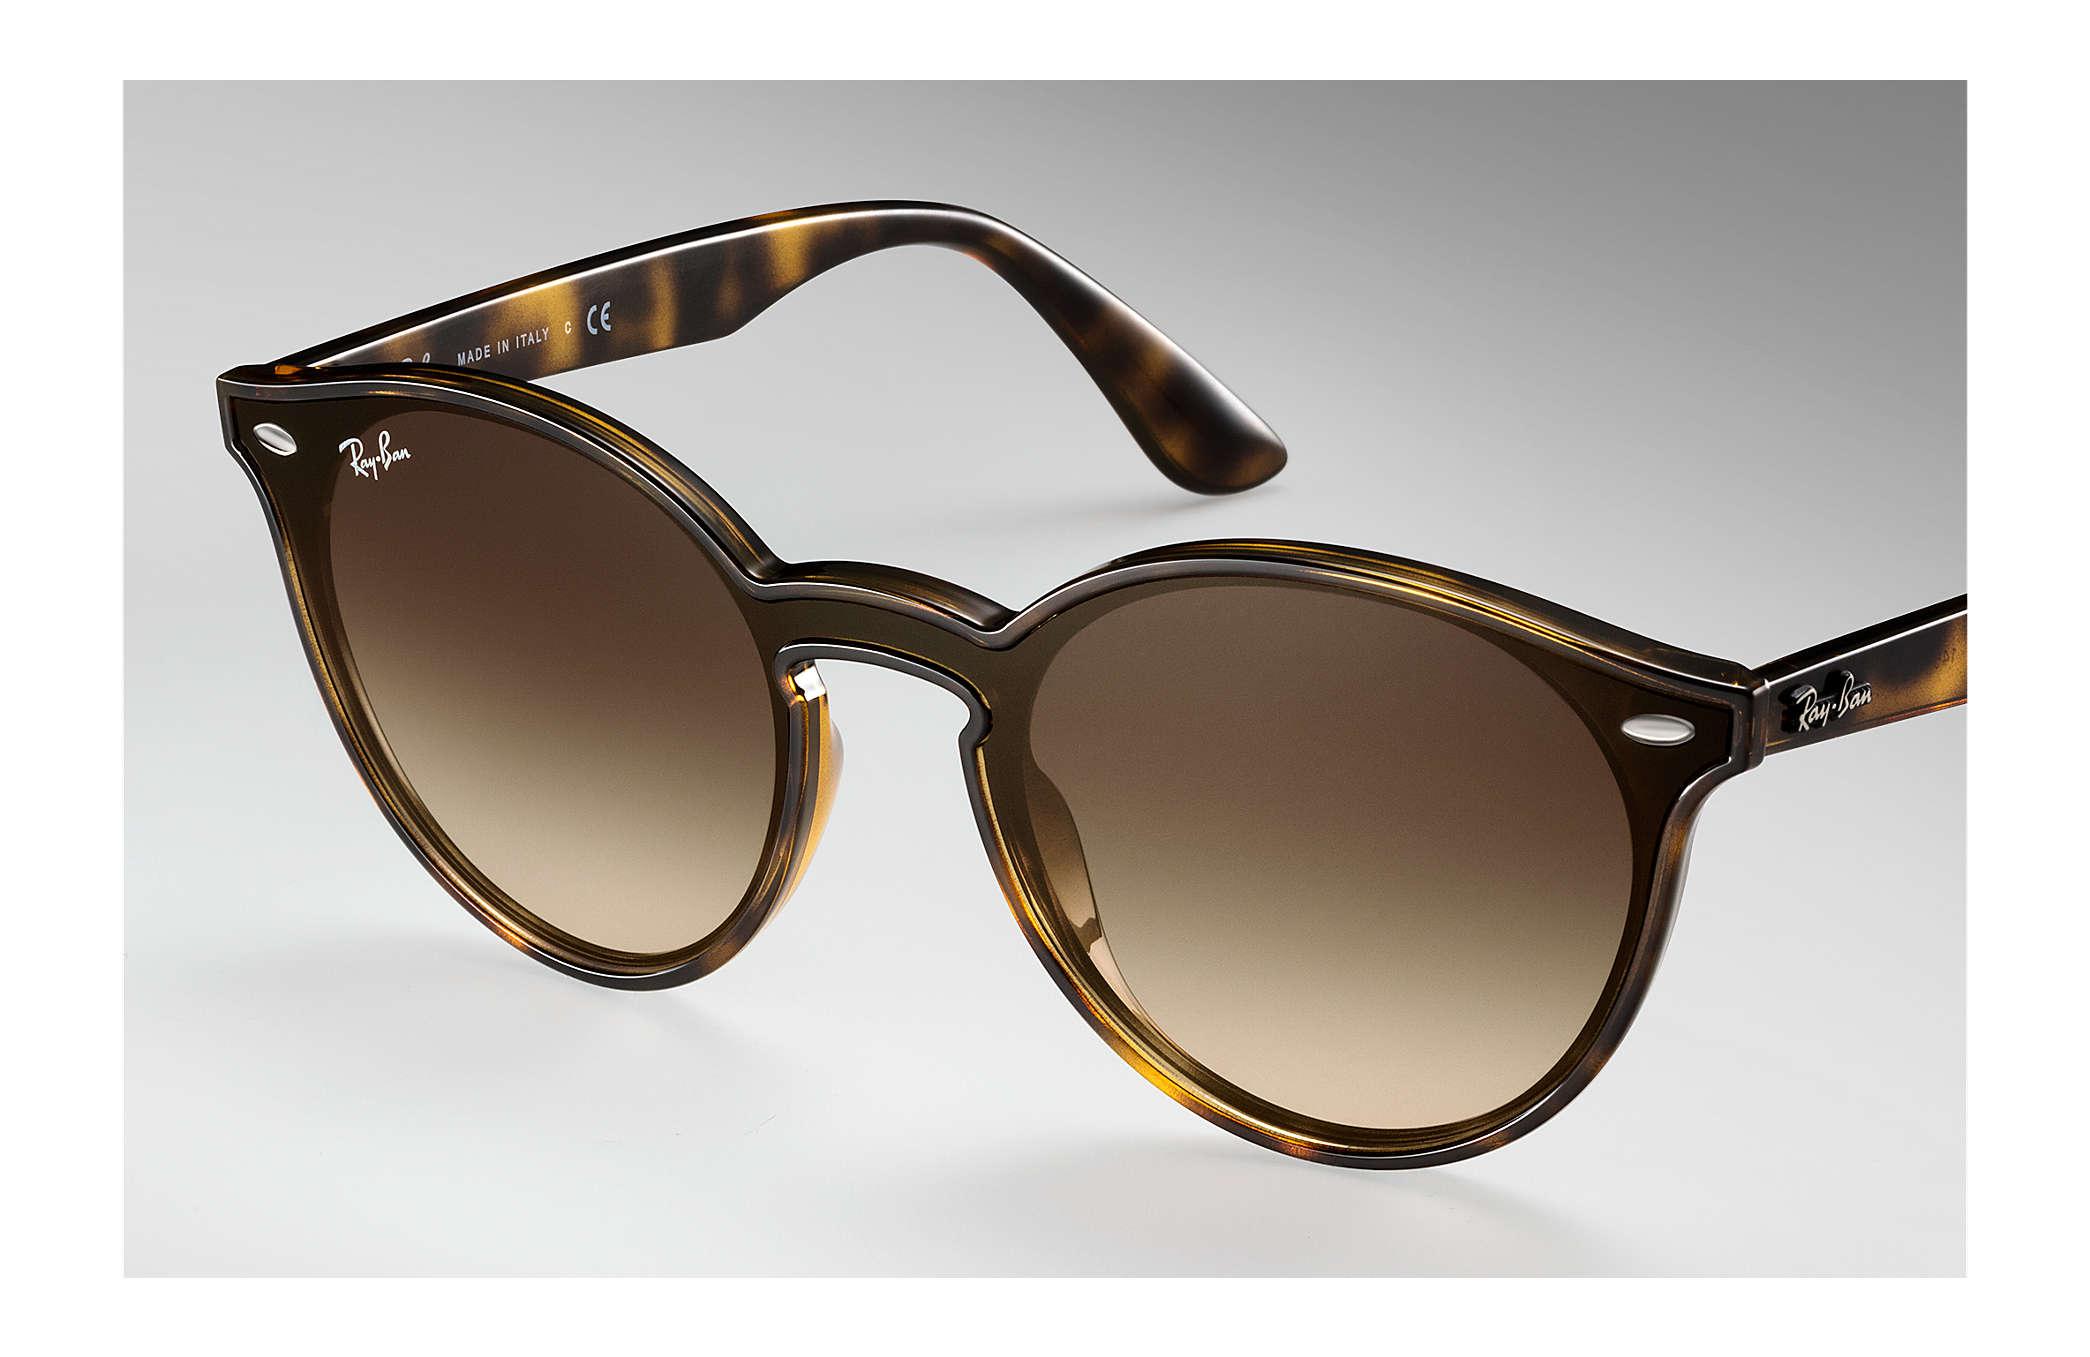 33f09f2a19 Ray-Ban Blaze Rb4380n RB4380N Tortoise - Nylon - Brown Lenses ...